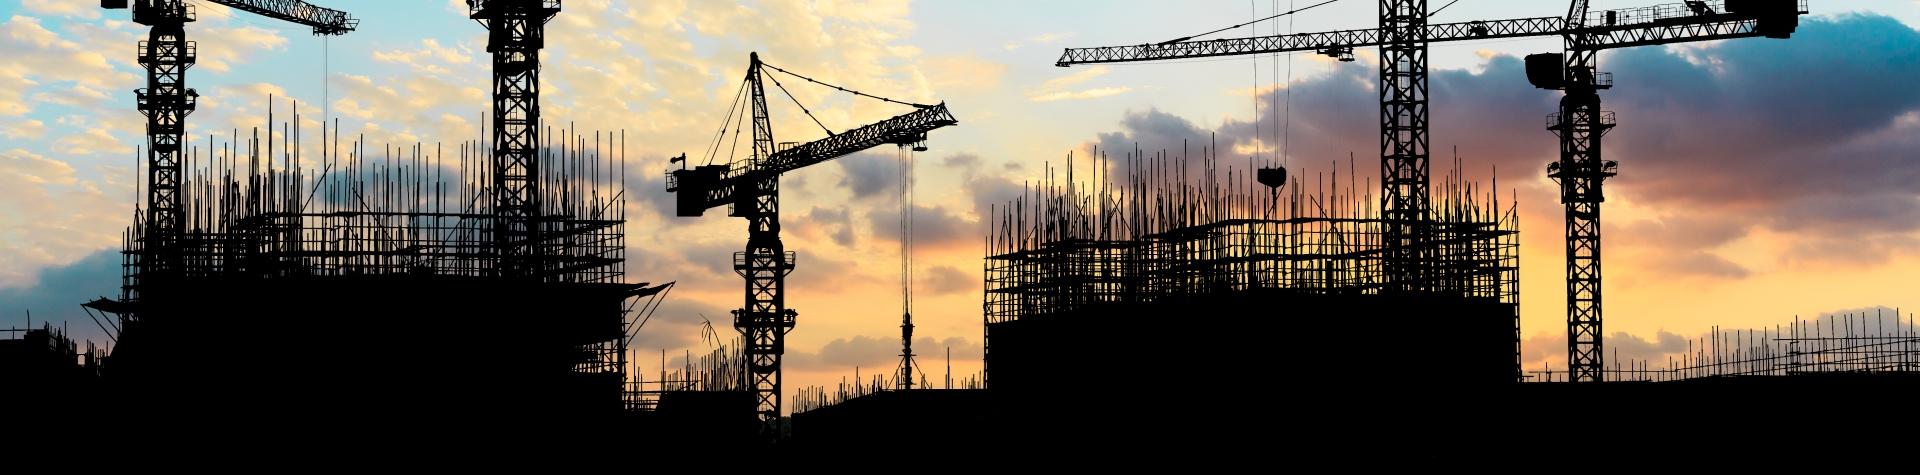 Cranes on a building site